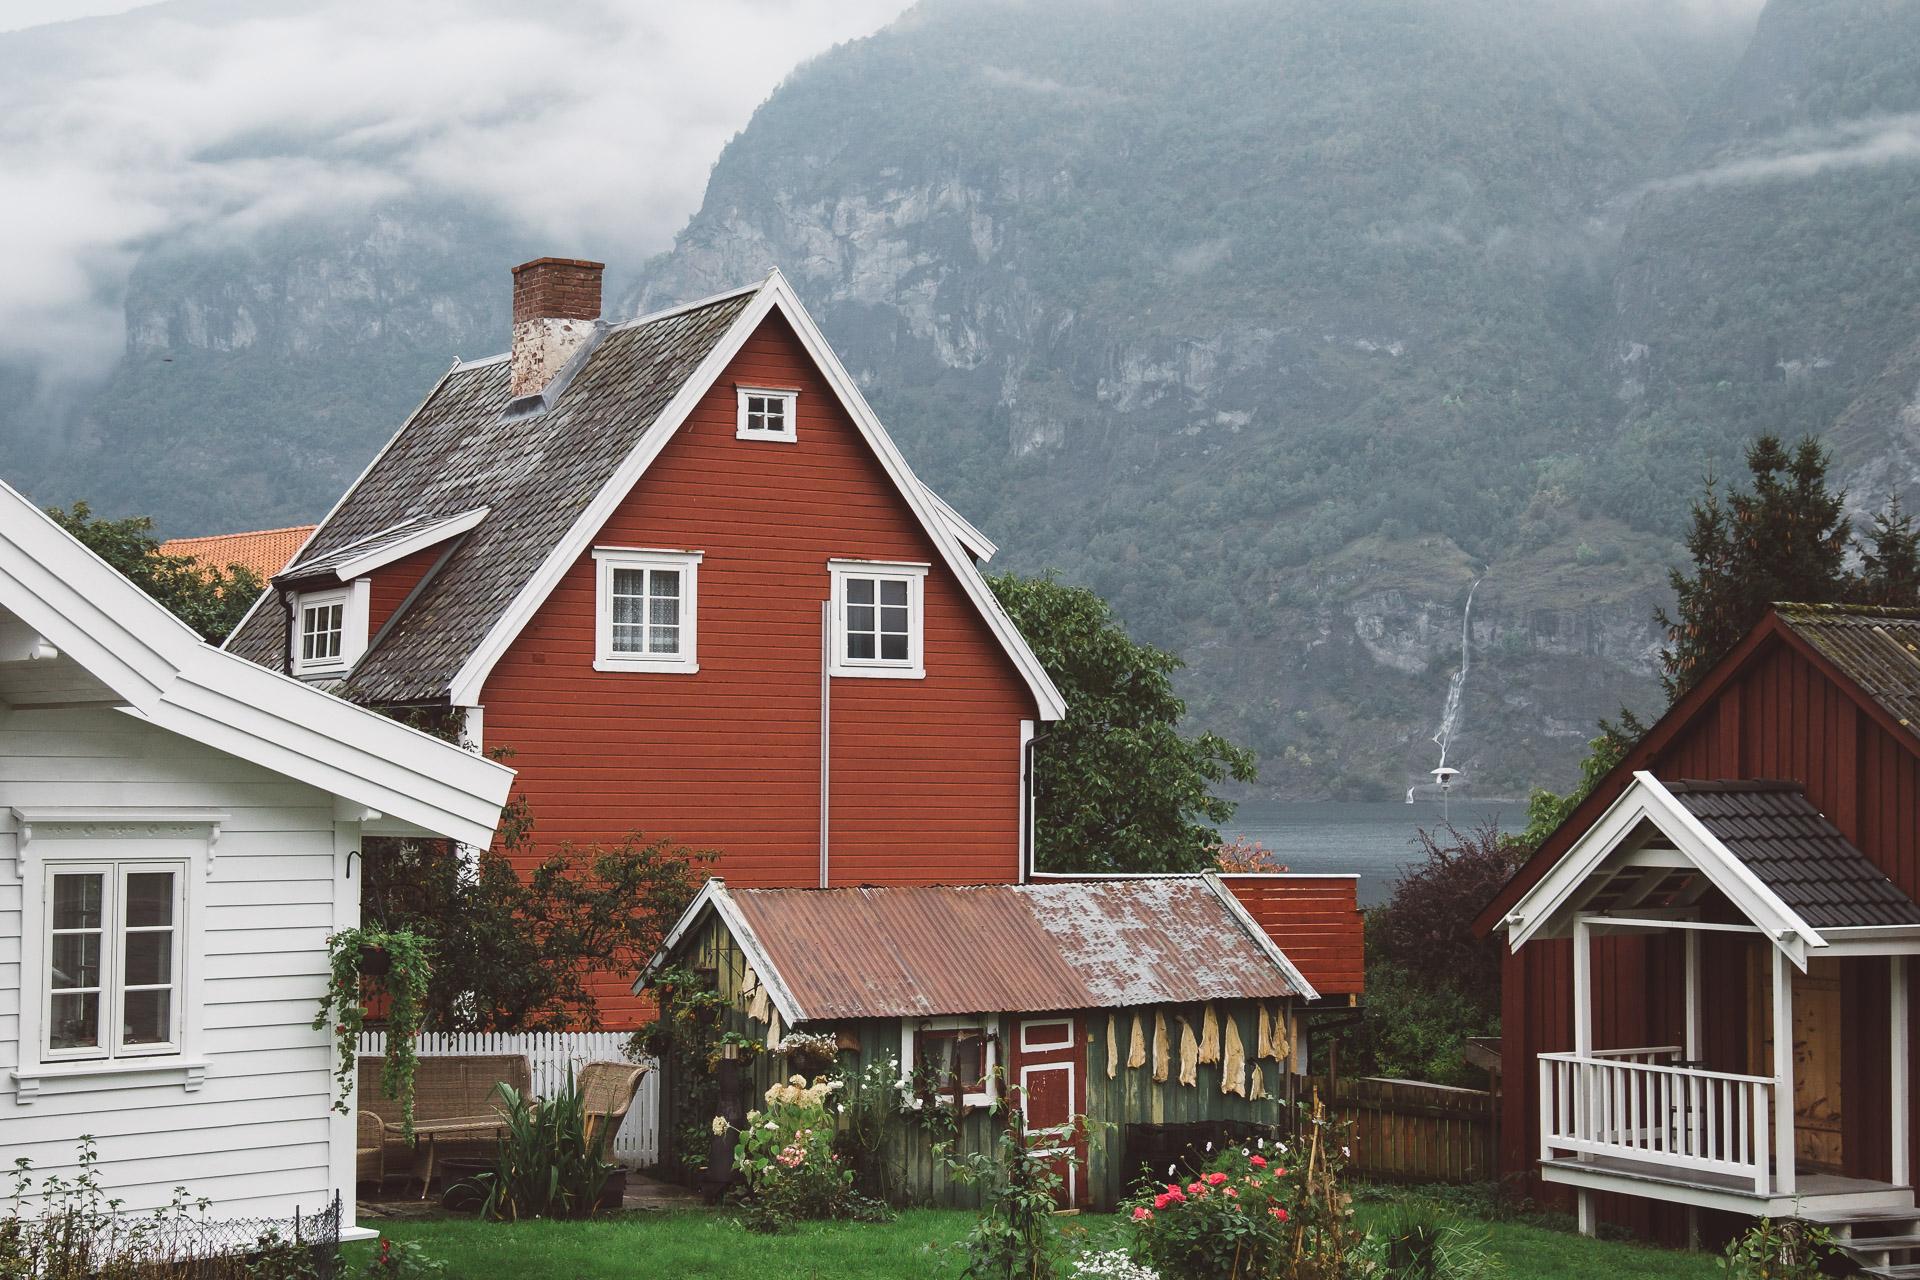 Sognefjord, Aurland, Fjordsafari, Fjords, Norway,